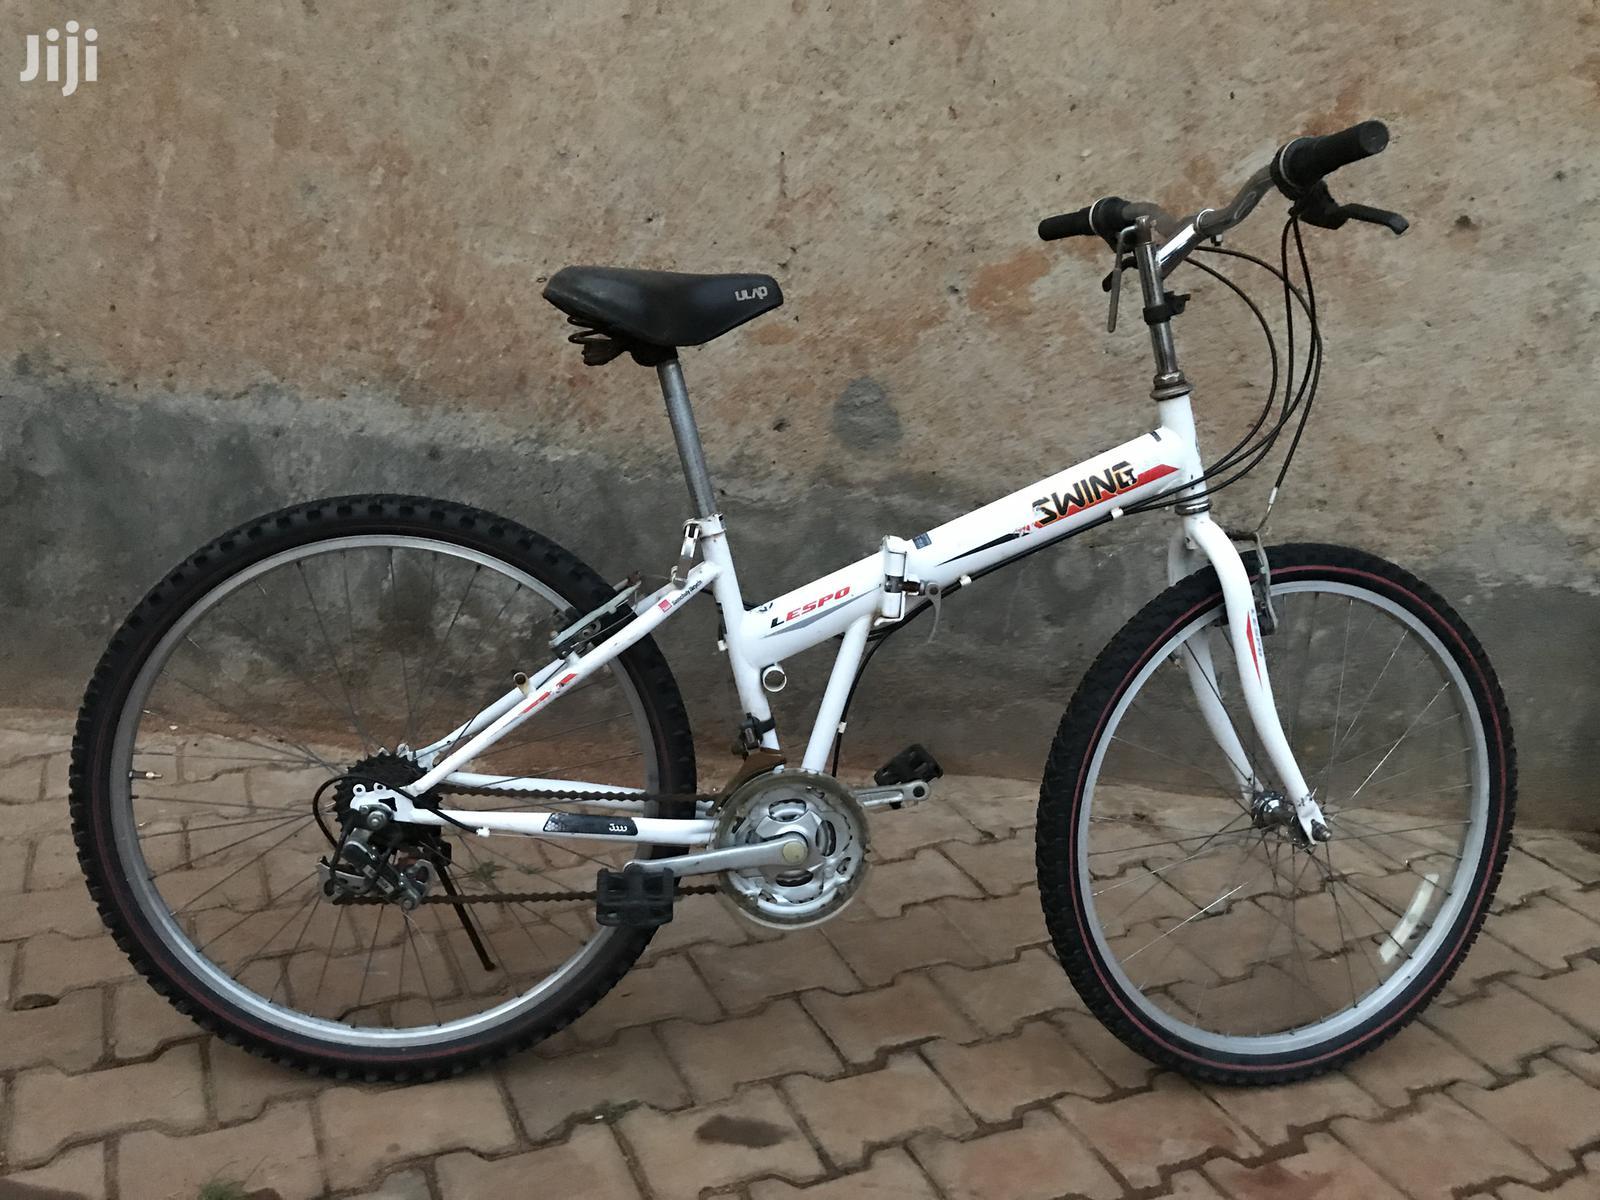 Mountain Bikes, Racing Sports | Sports Equipment for sale in Kampala, Central Region, Uganda